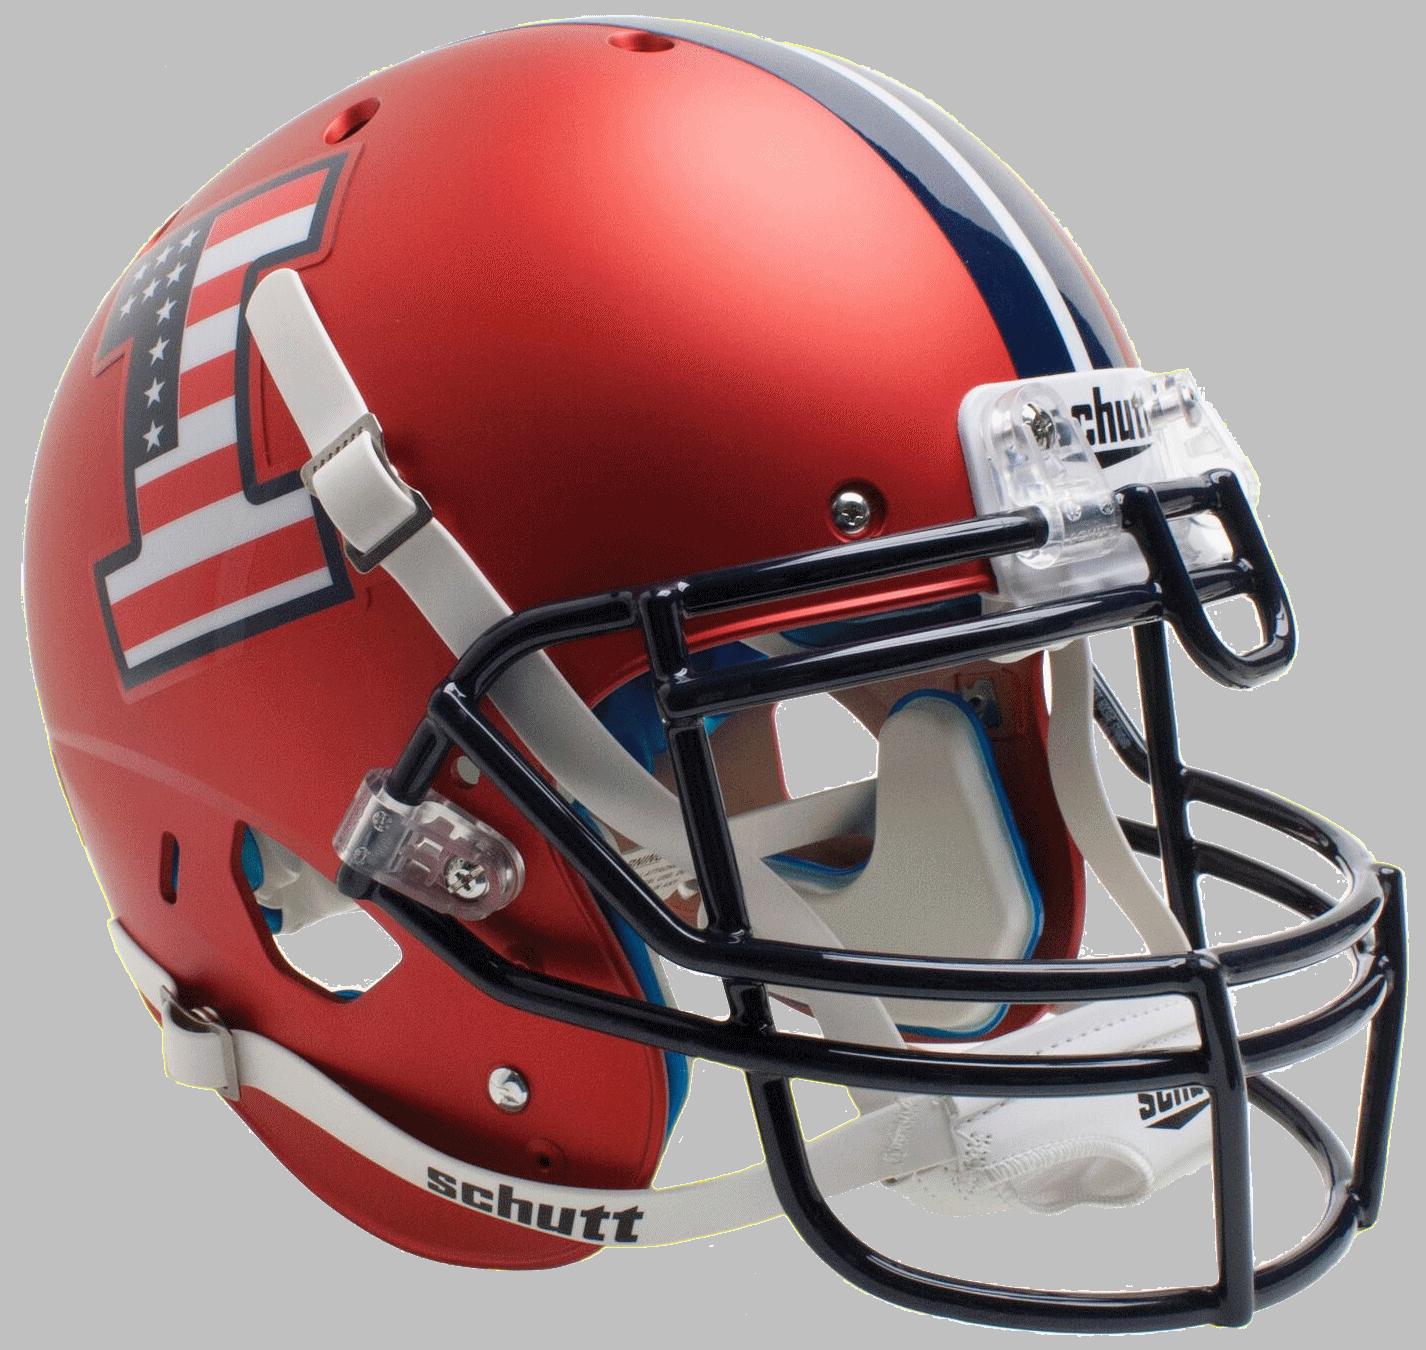 Illinois Fighting Illini Authentic College XP Football Helmet Schutt <B>Satin Orange Flag Decal</B>